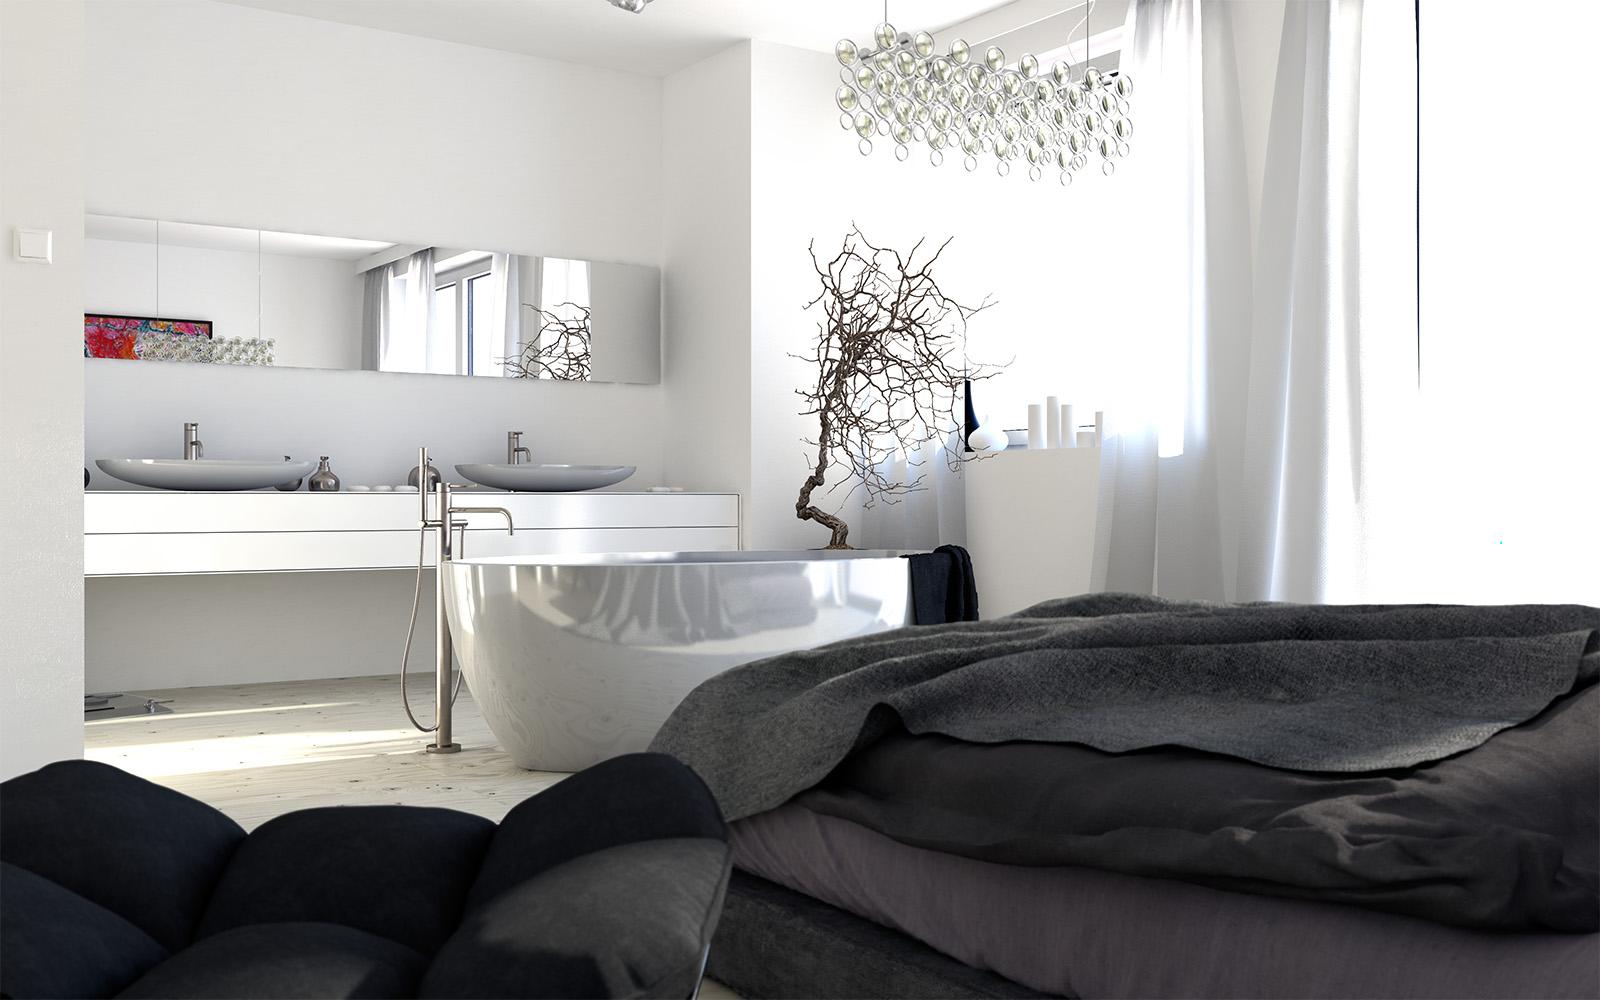 Central Bathtub Interior Design Ideas